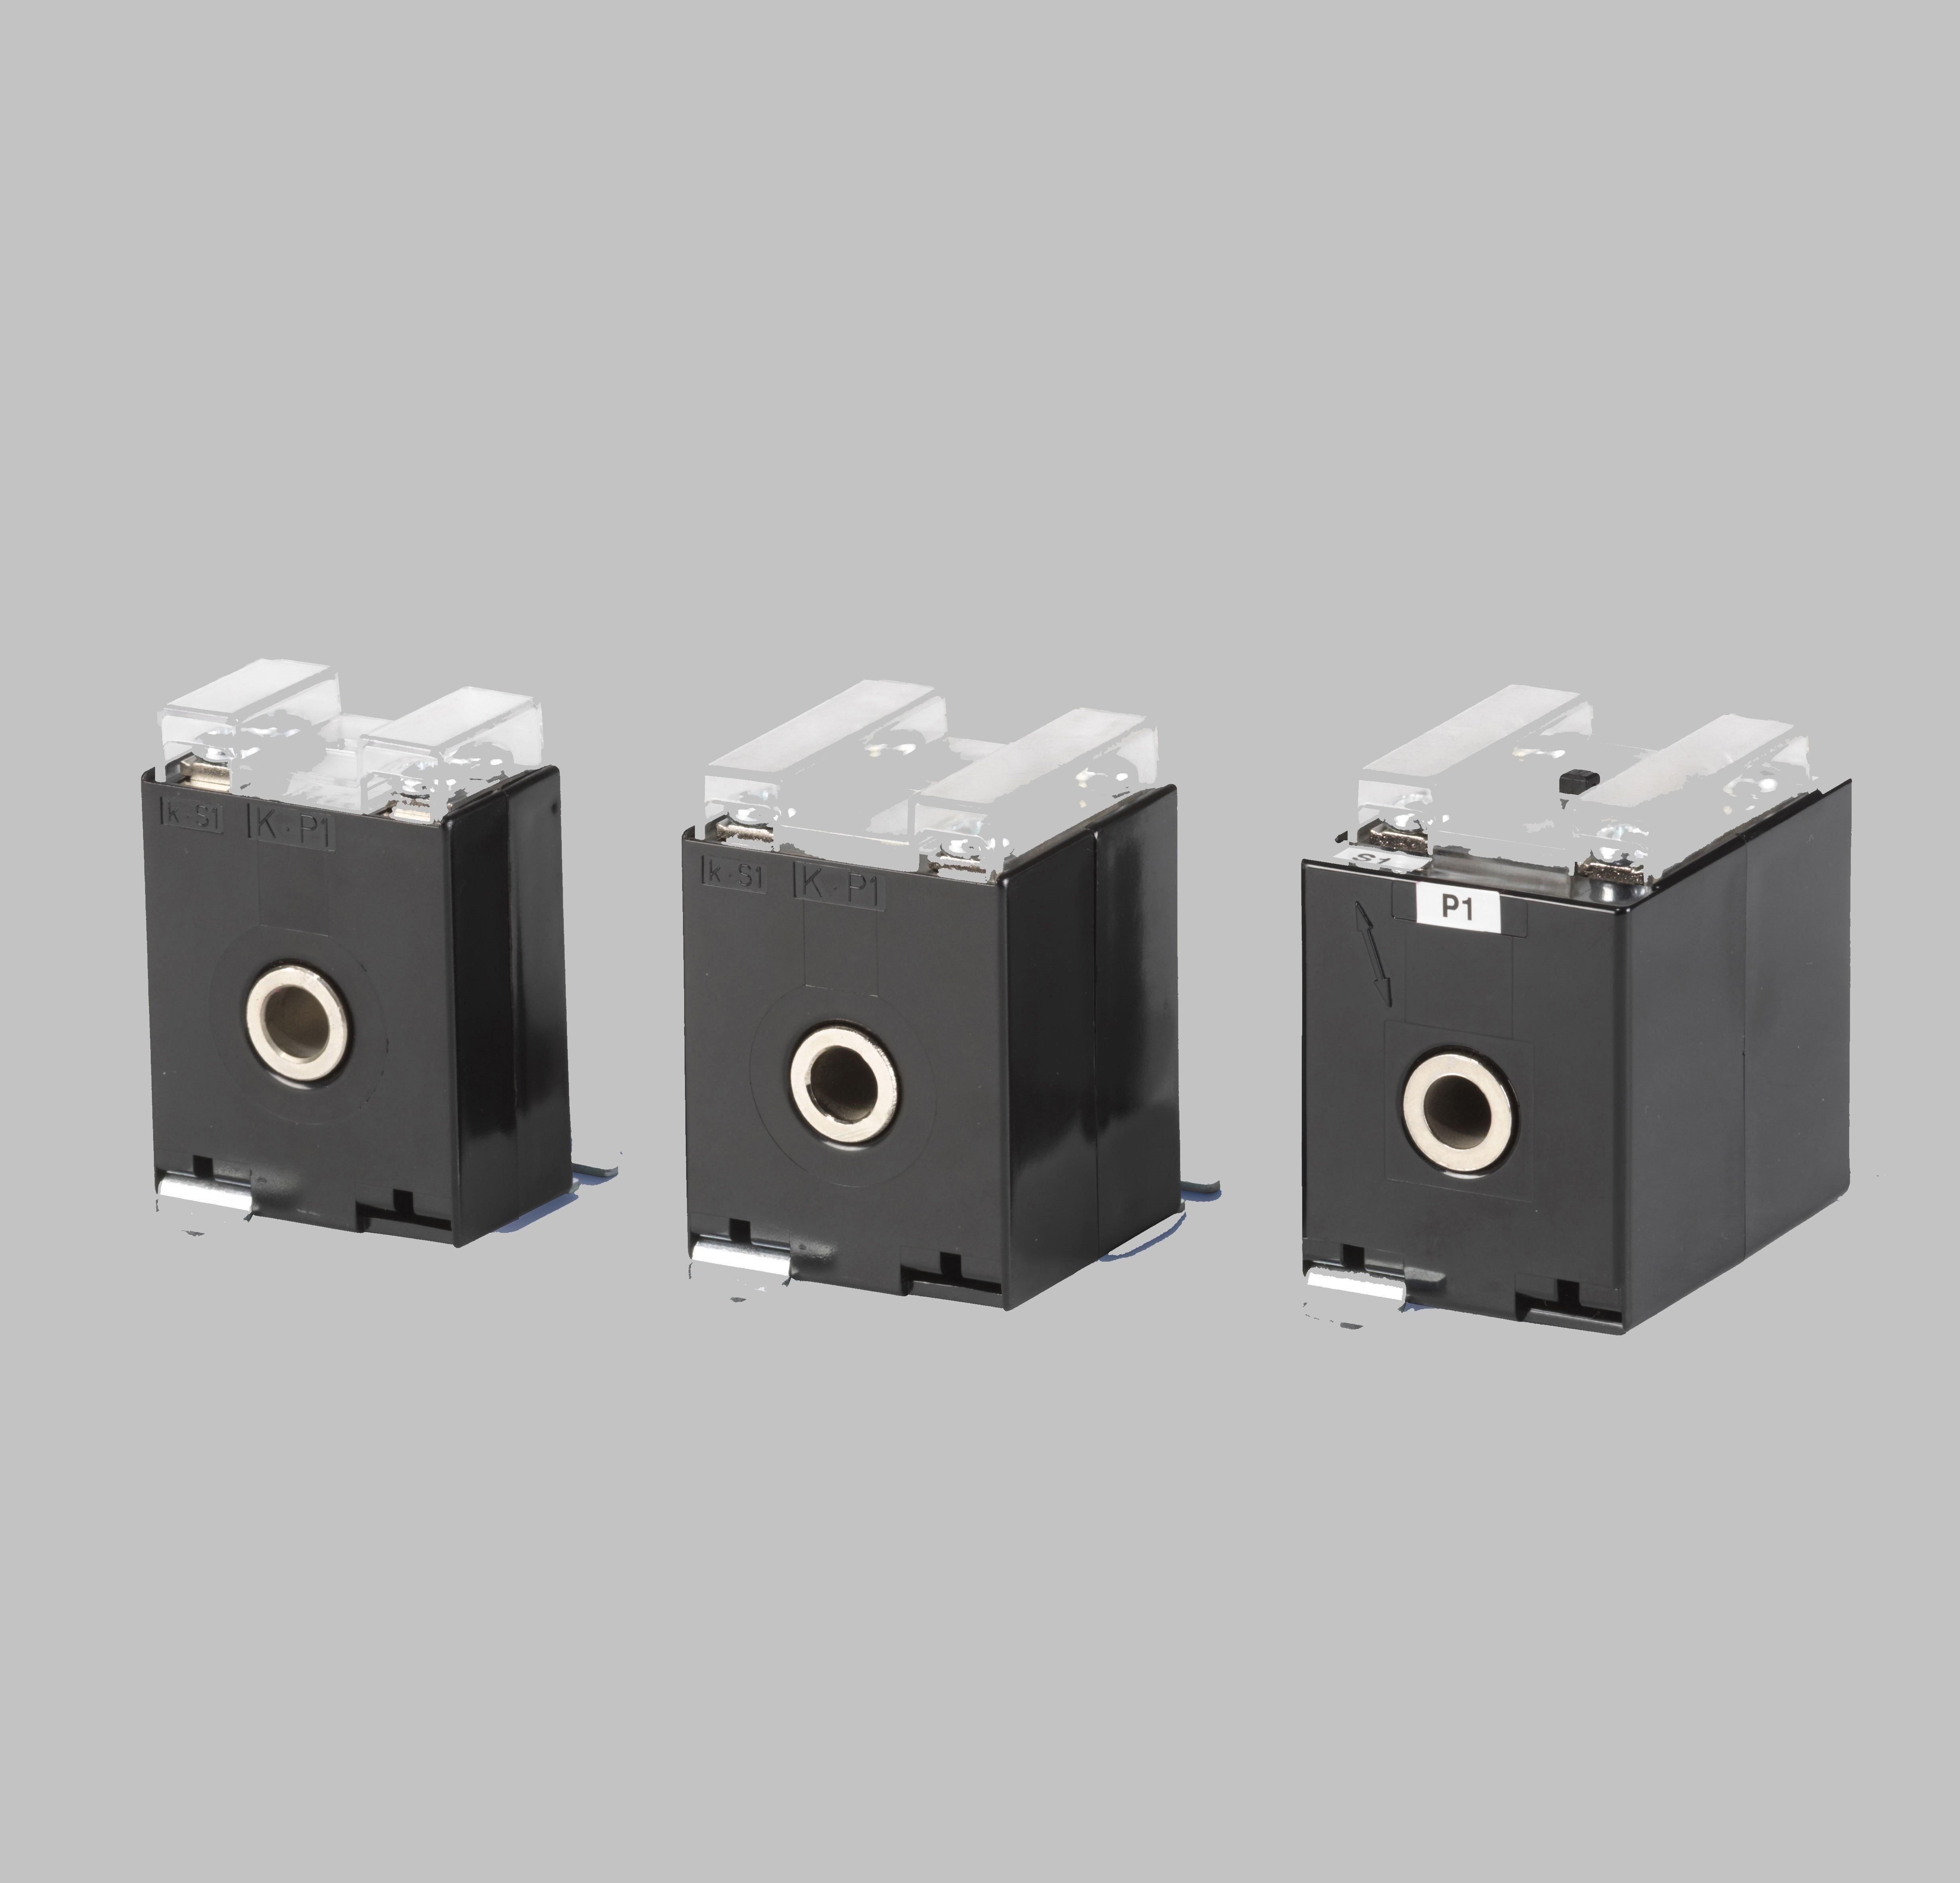 KSR 50 Innenraum Rohrstab-Stromwandler Niederspannung